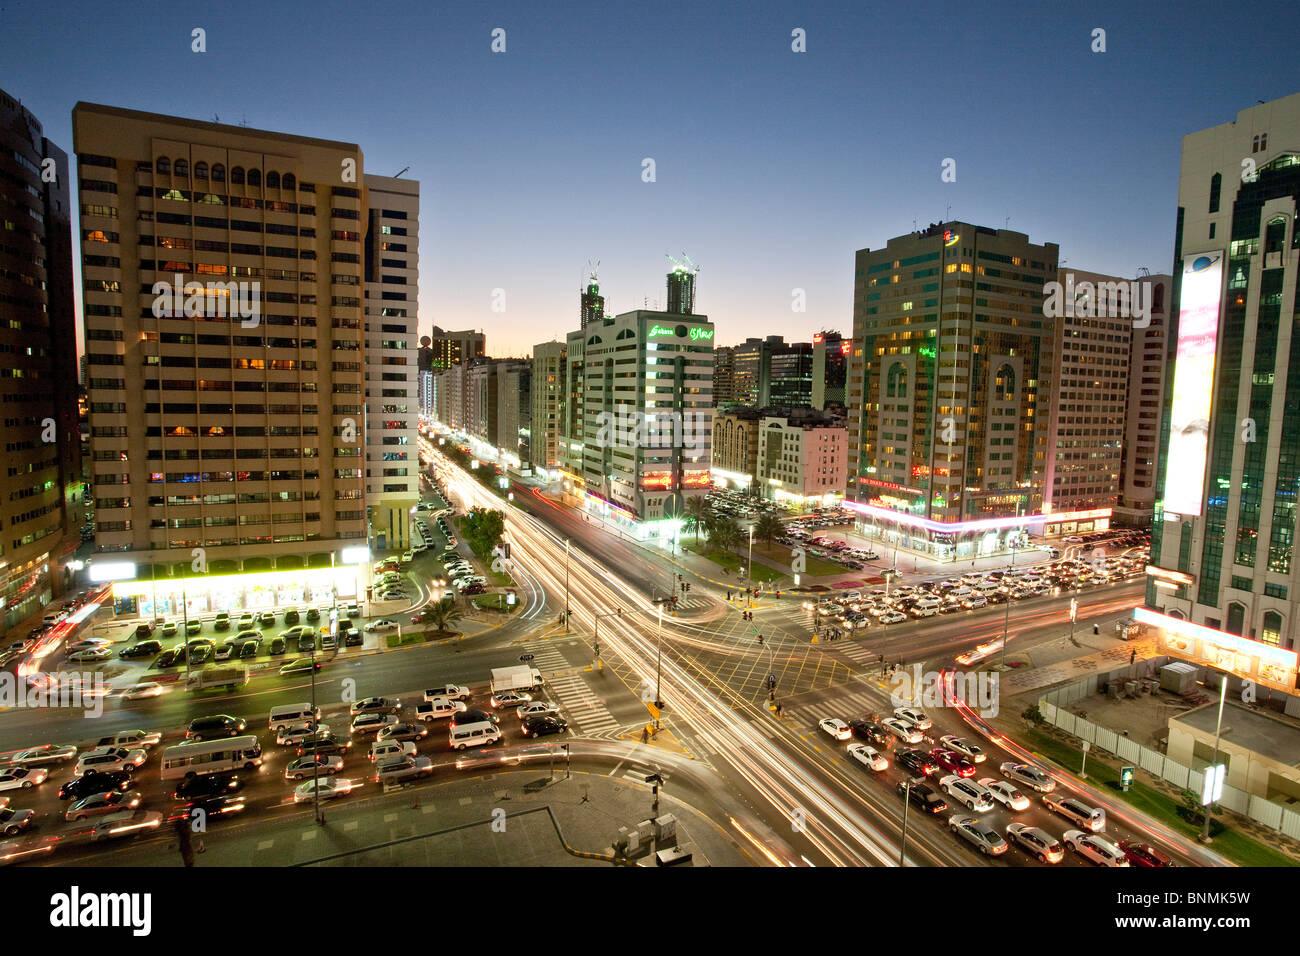 Abu Dhabi, Emiratos Arabes Unidos ORIENTE MEDIO viajar lugar de interés histórico Imagen De Stock